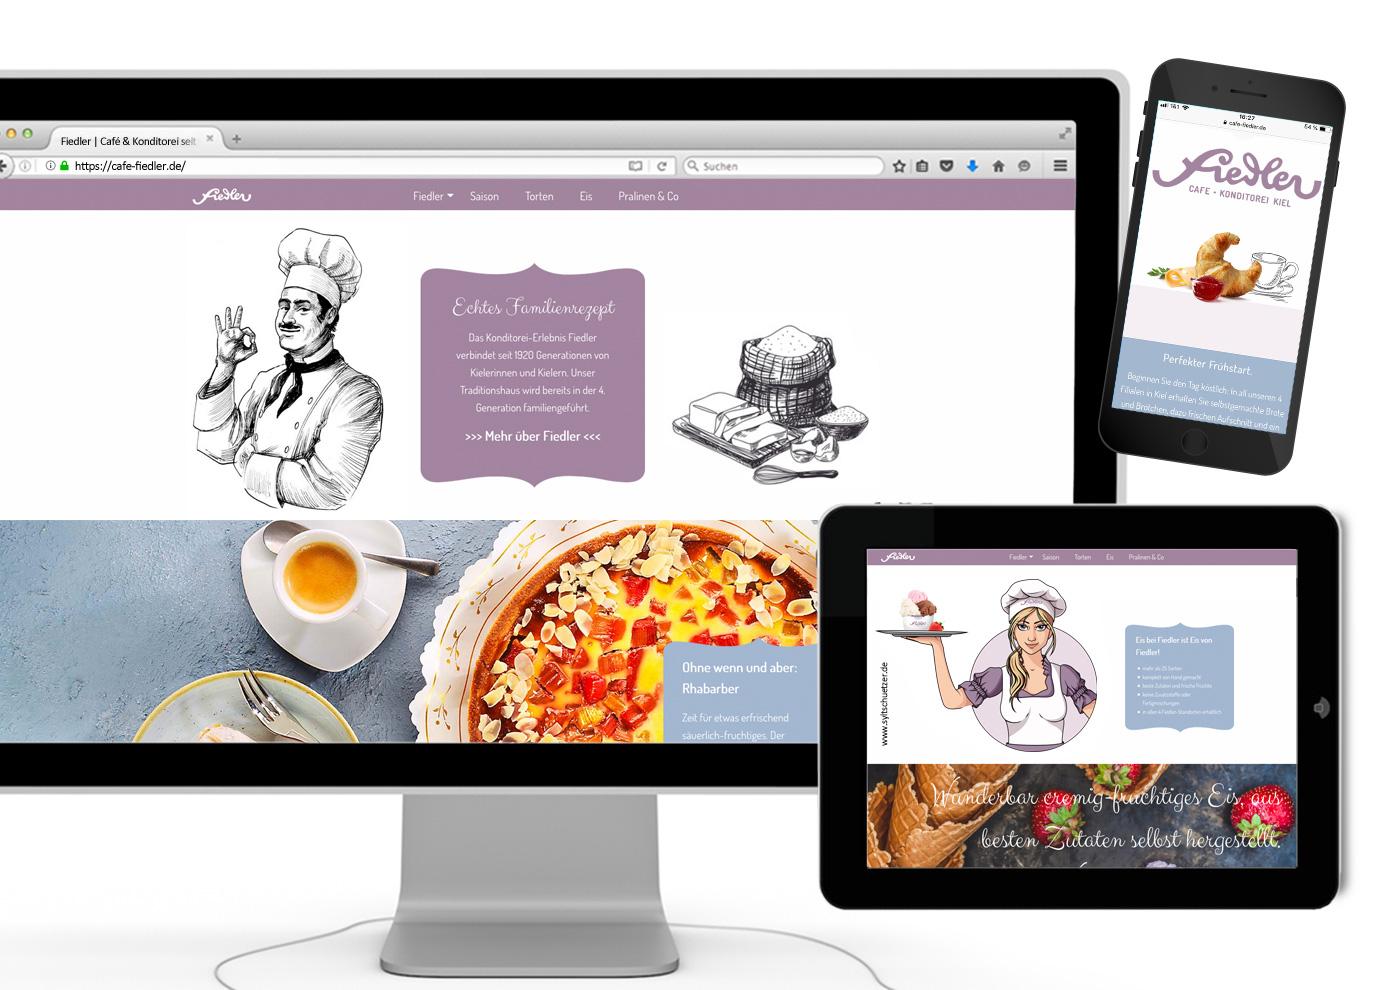 CD-Relaunch, Web und Social Media für Café Fiedler - Web